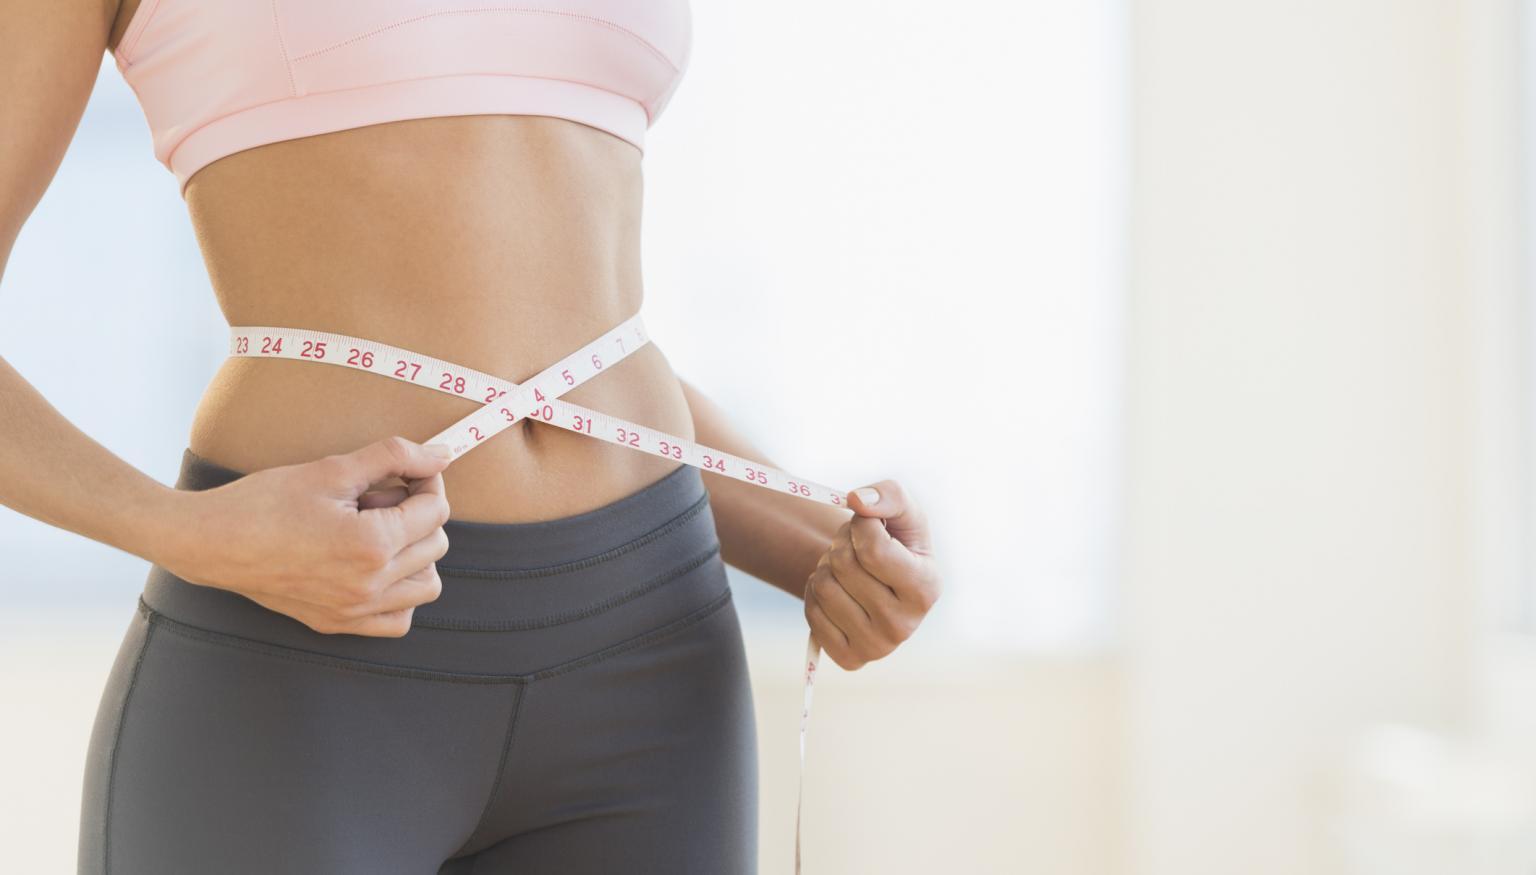 Agile fat loss agency image 7